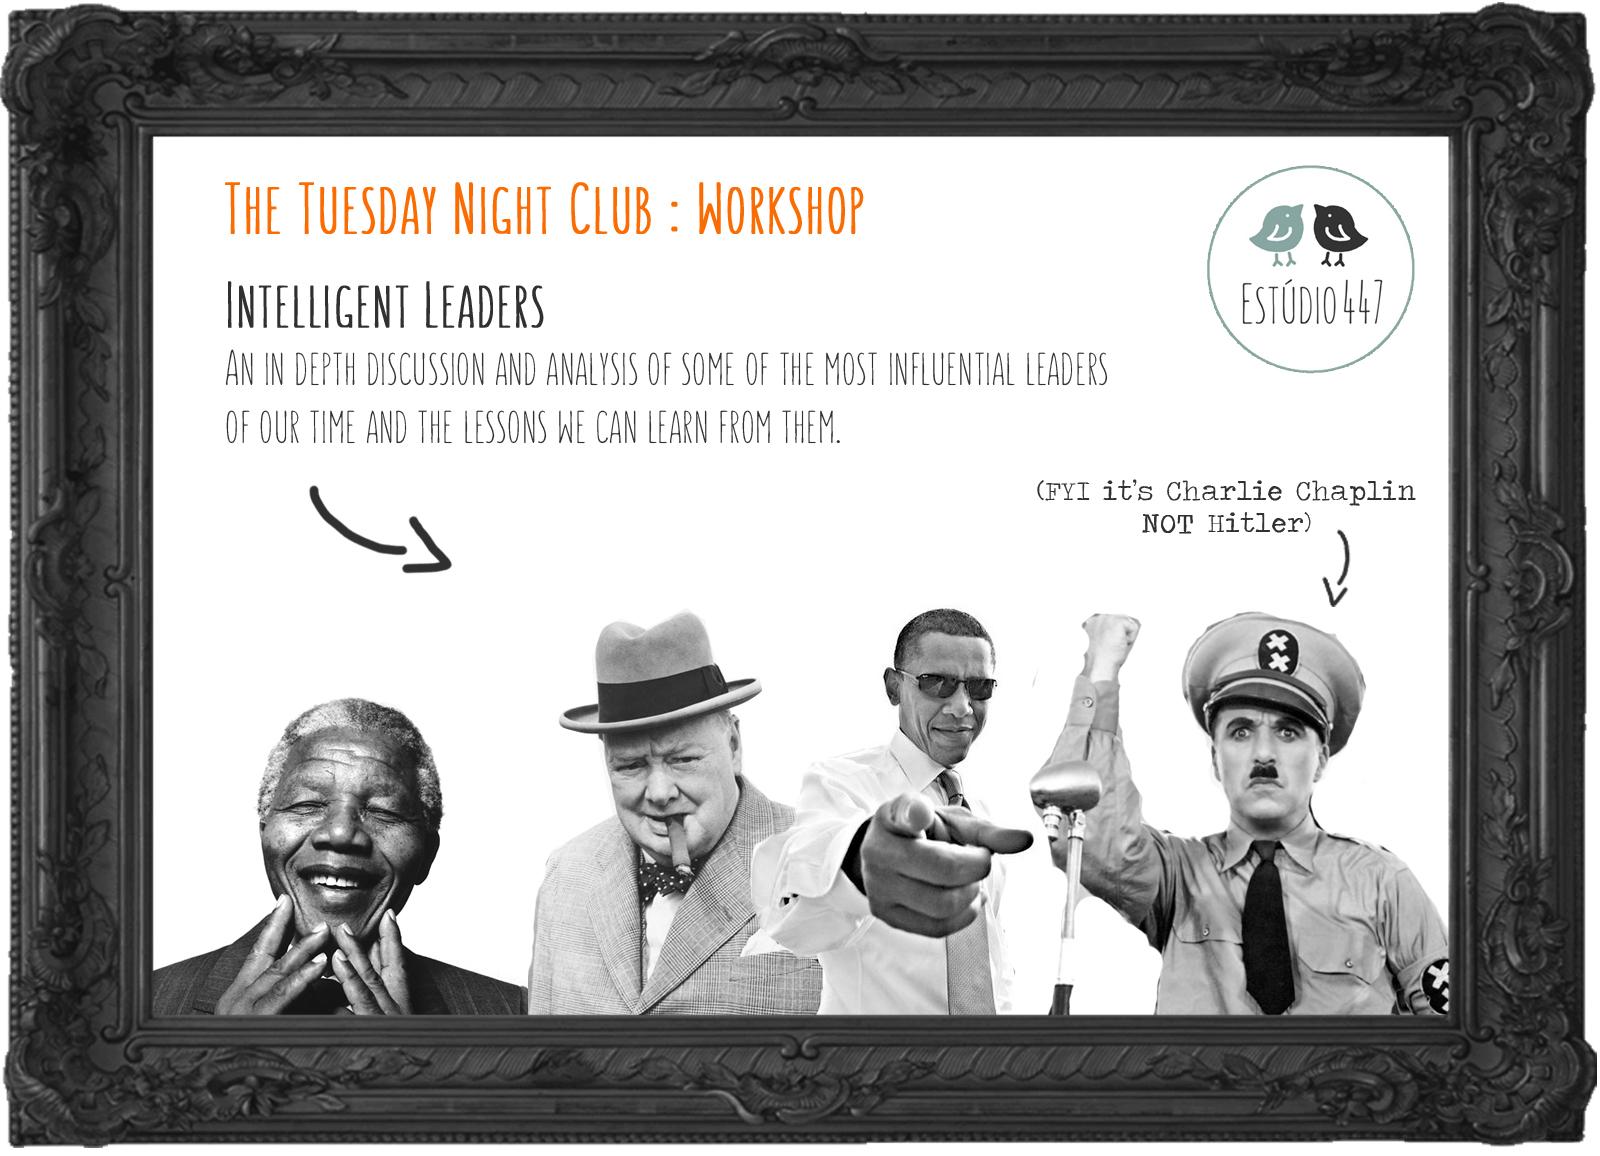 Intelligent leaders workshop poster.jpg